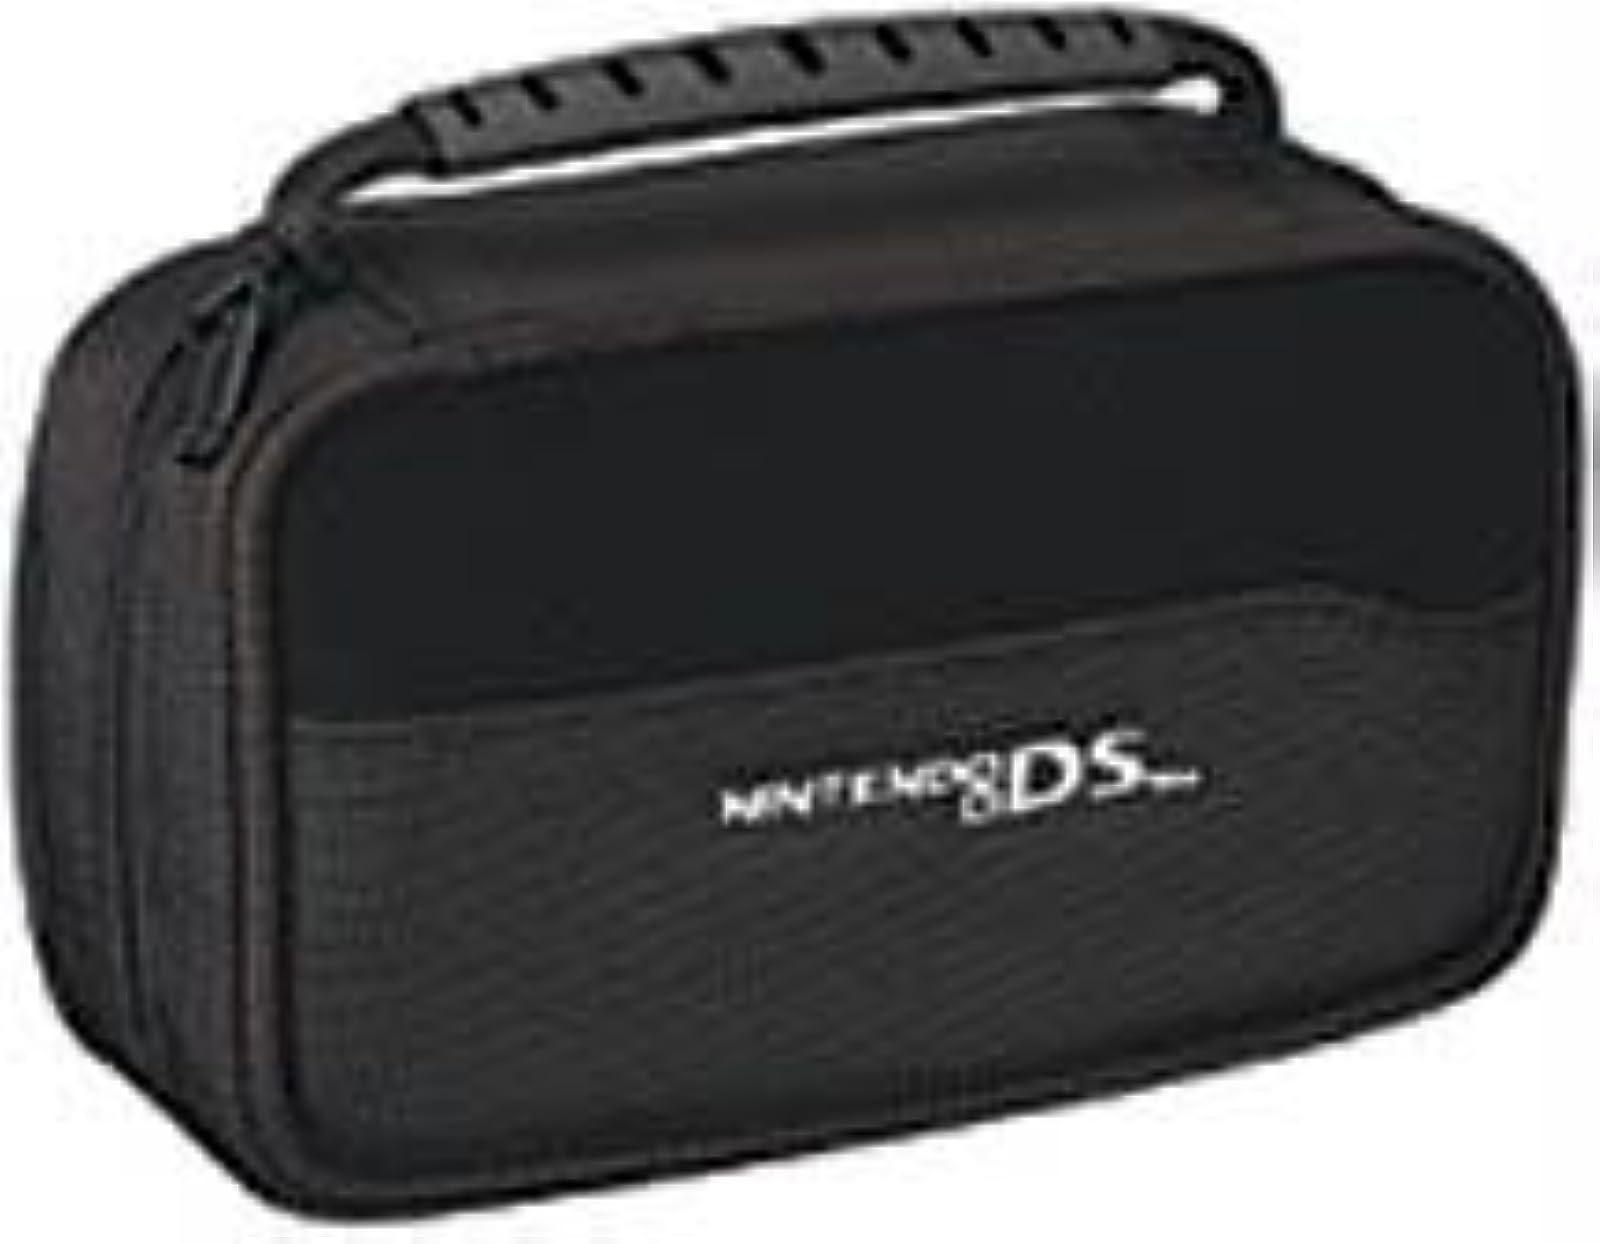 ALS Industries Nintendo DS -14 Carrying Case Black